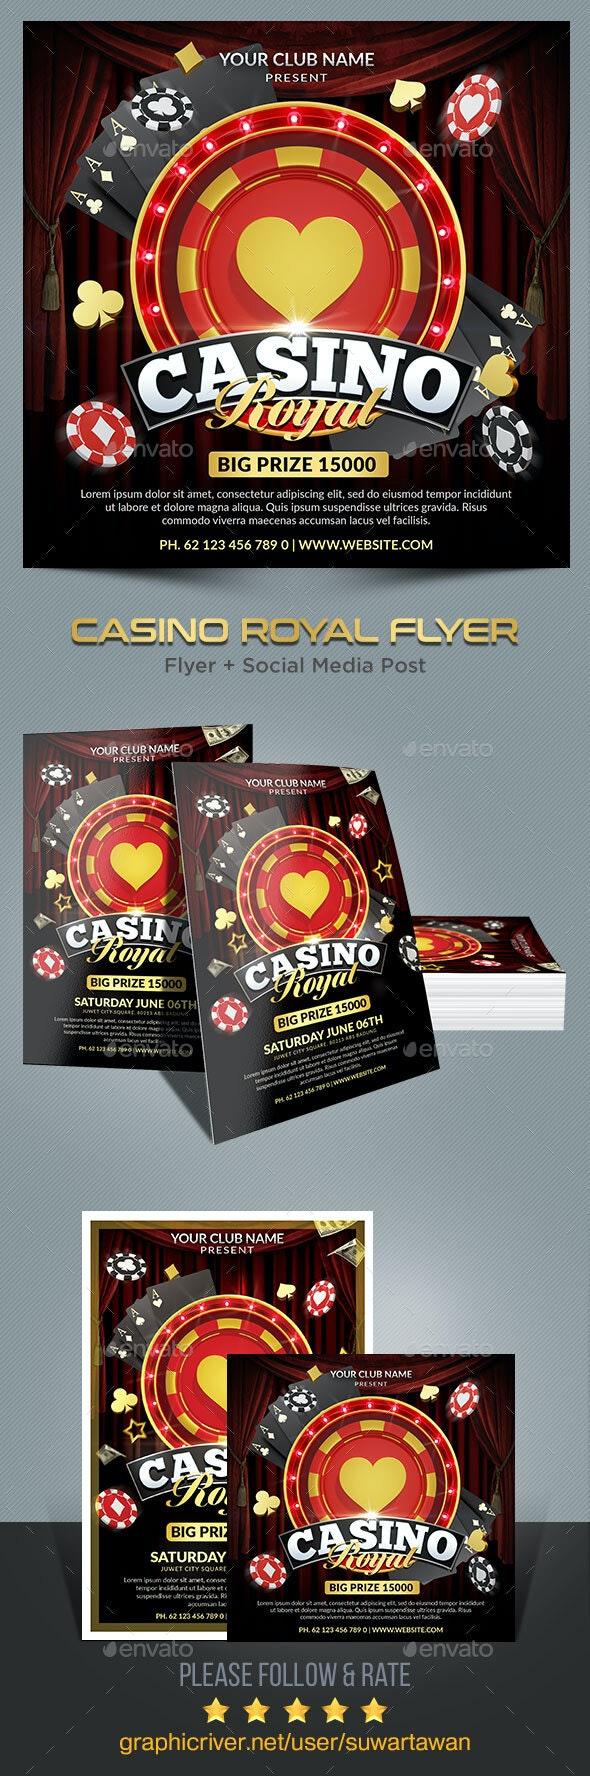 Casino Royal Flyer - Print Templates